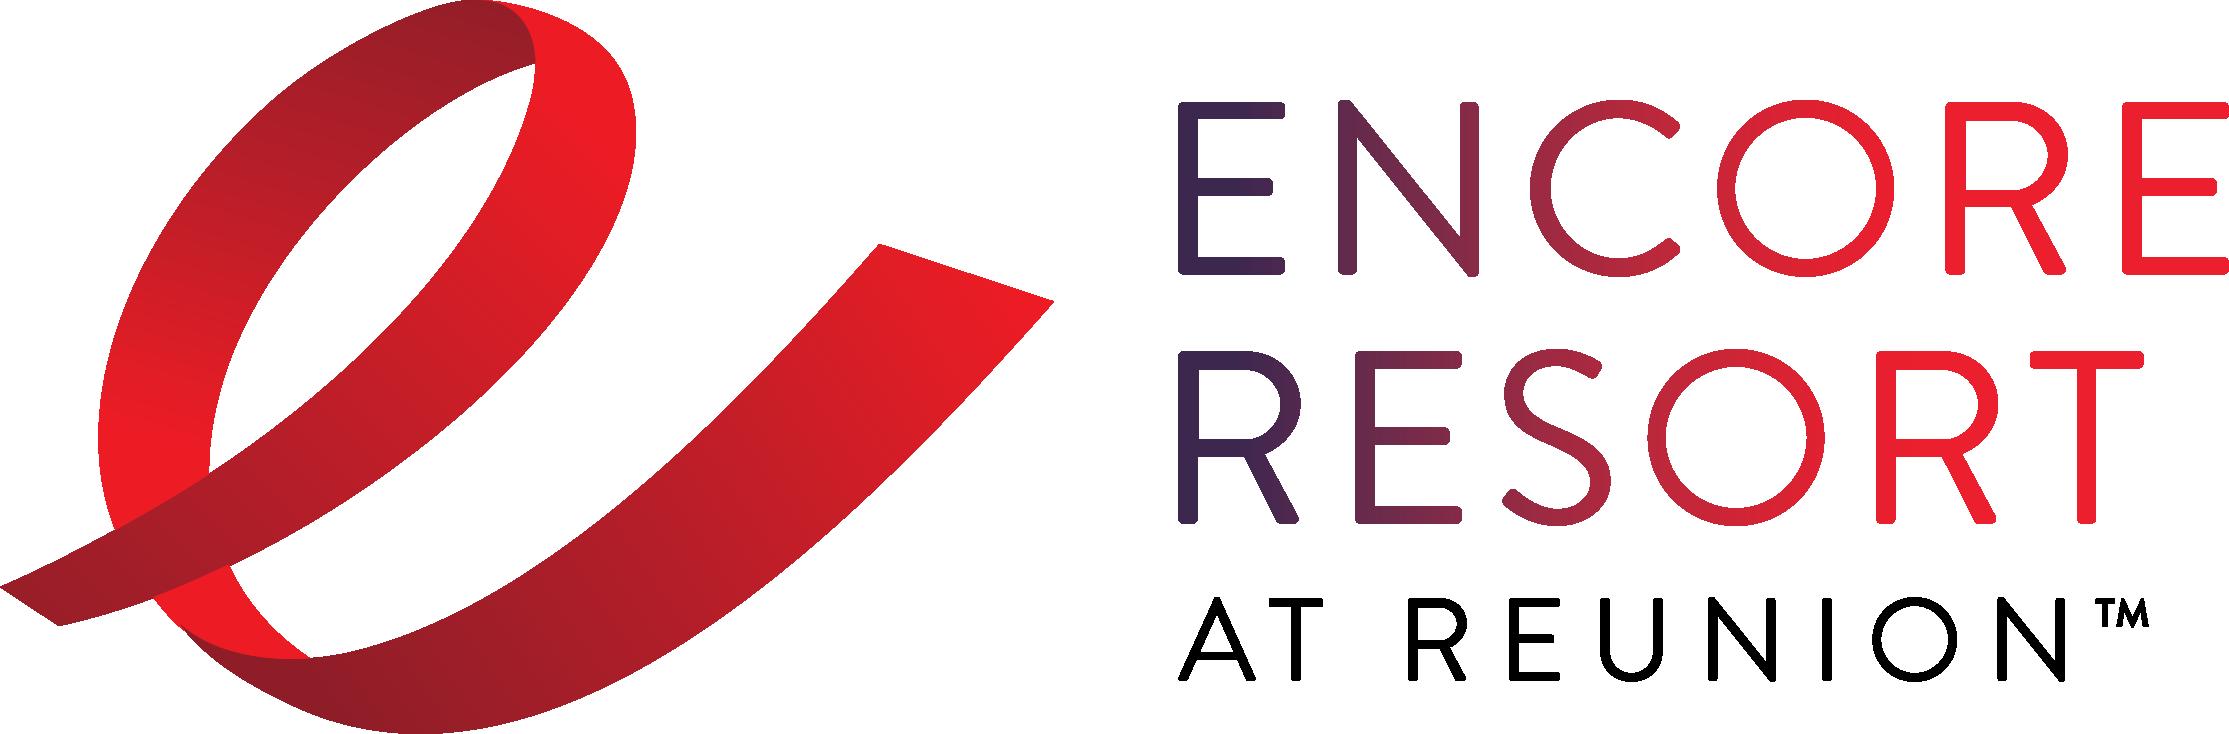 Encore_Resort_Horz_logo